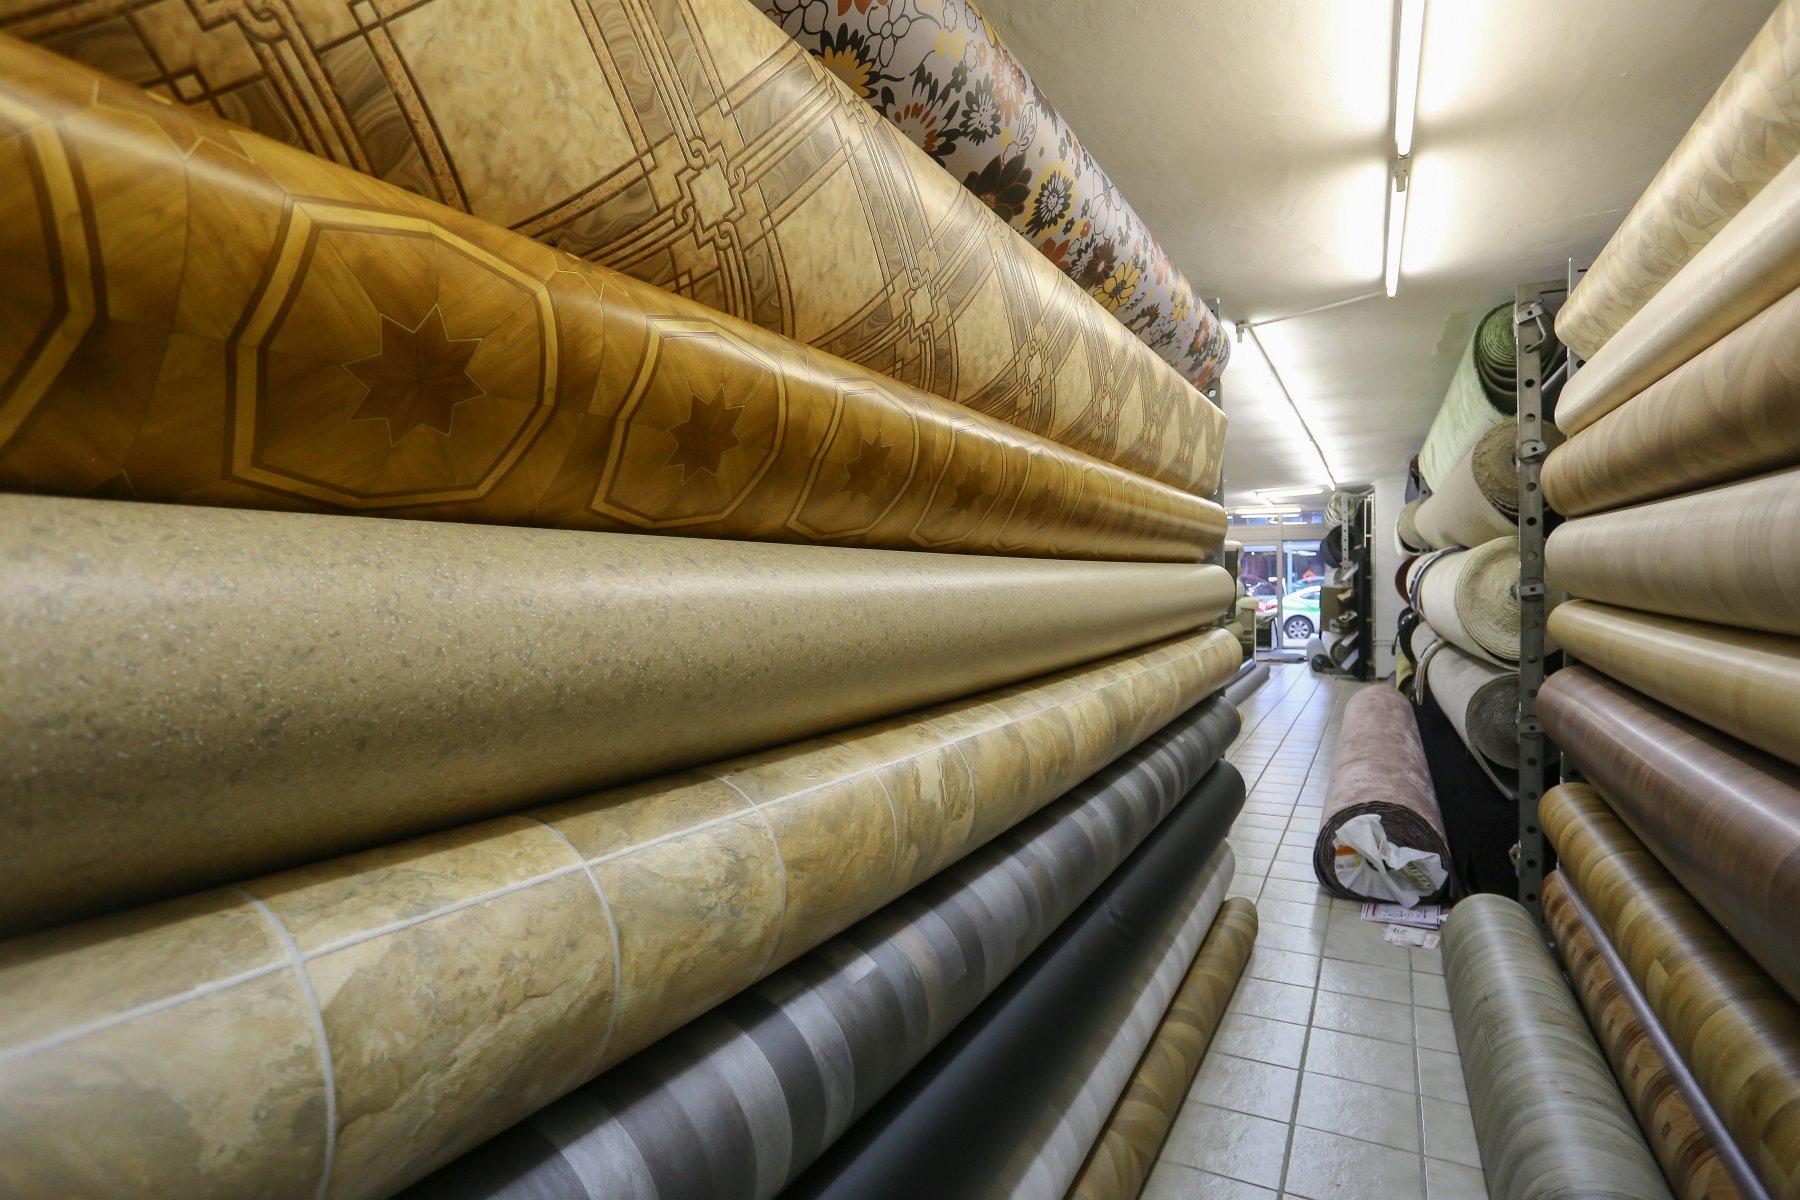 Goedkope Vinyl Restanten : Vinyl vloer den haag